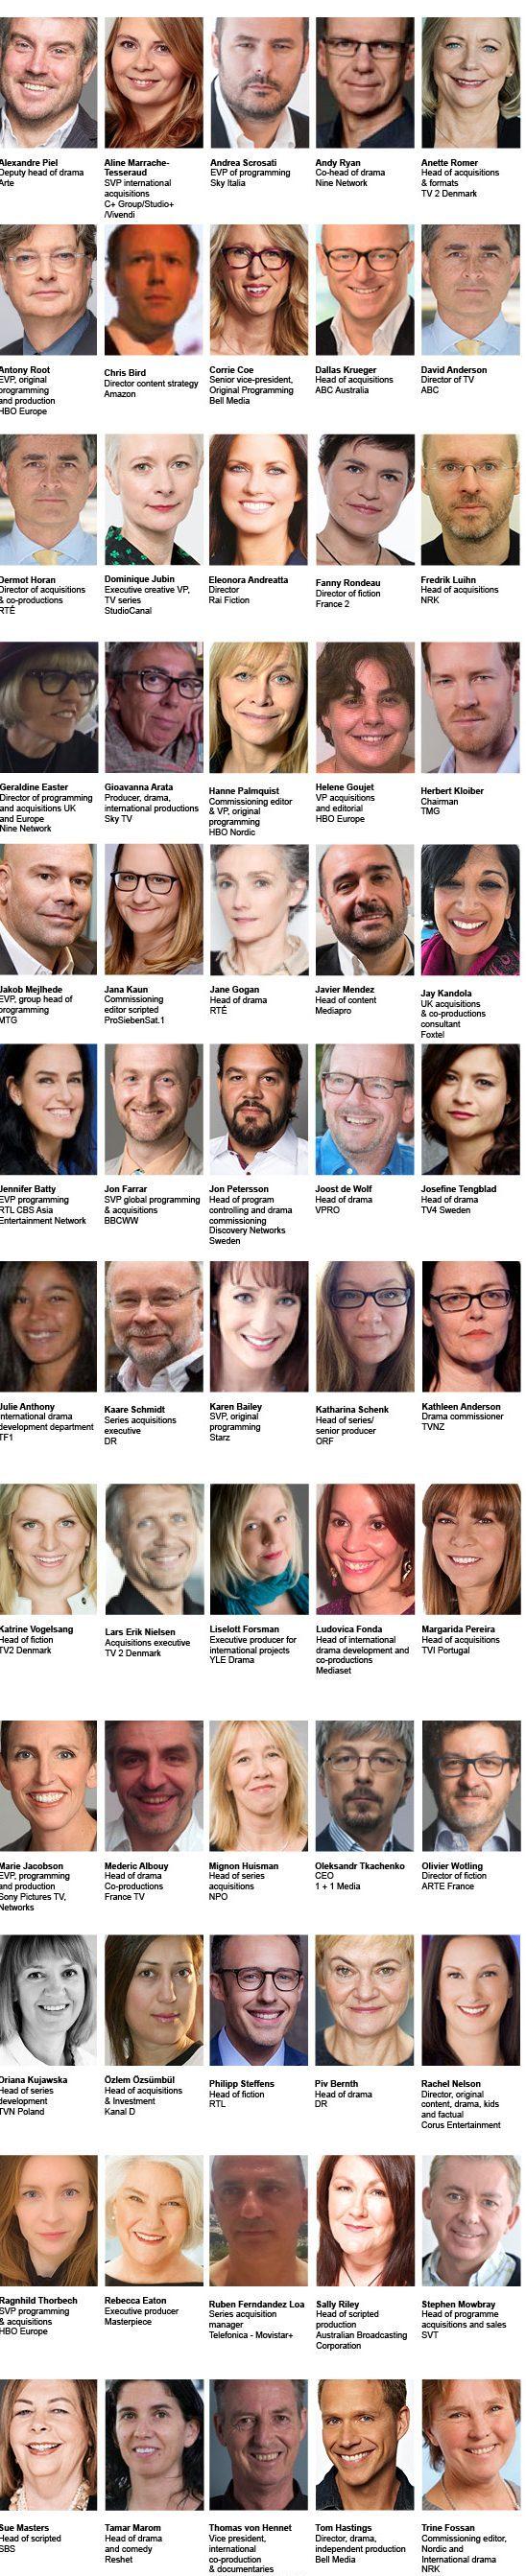 Drama Awards Judges 2017